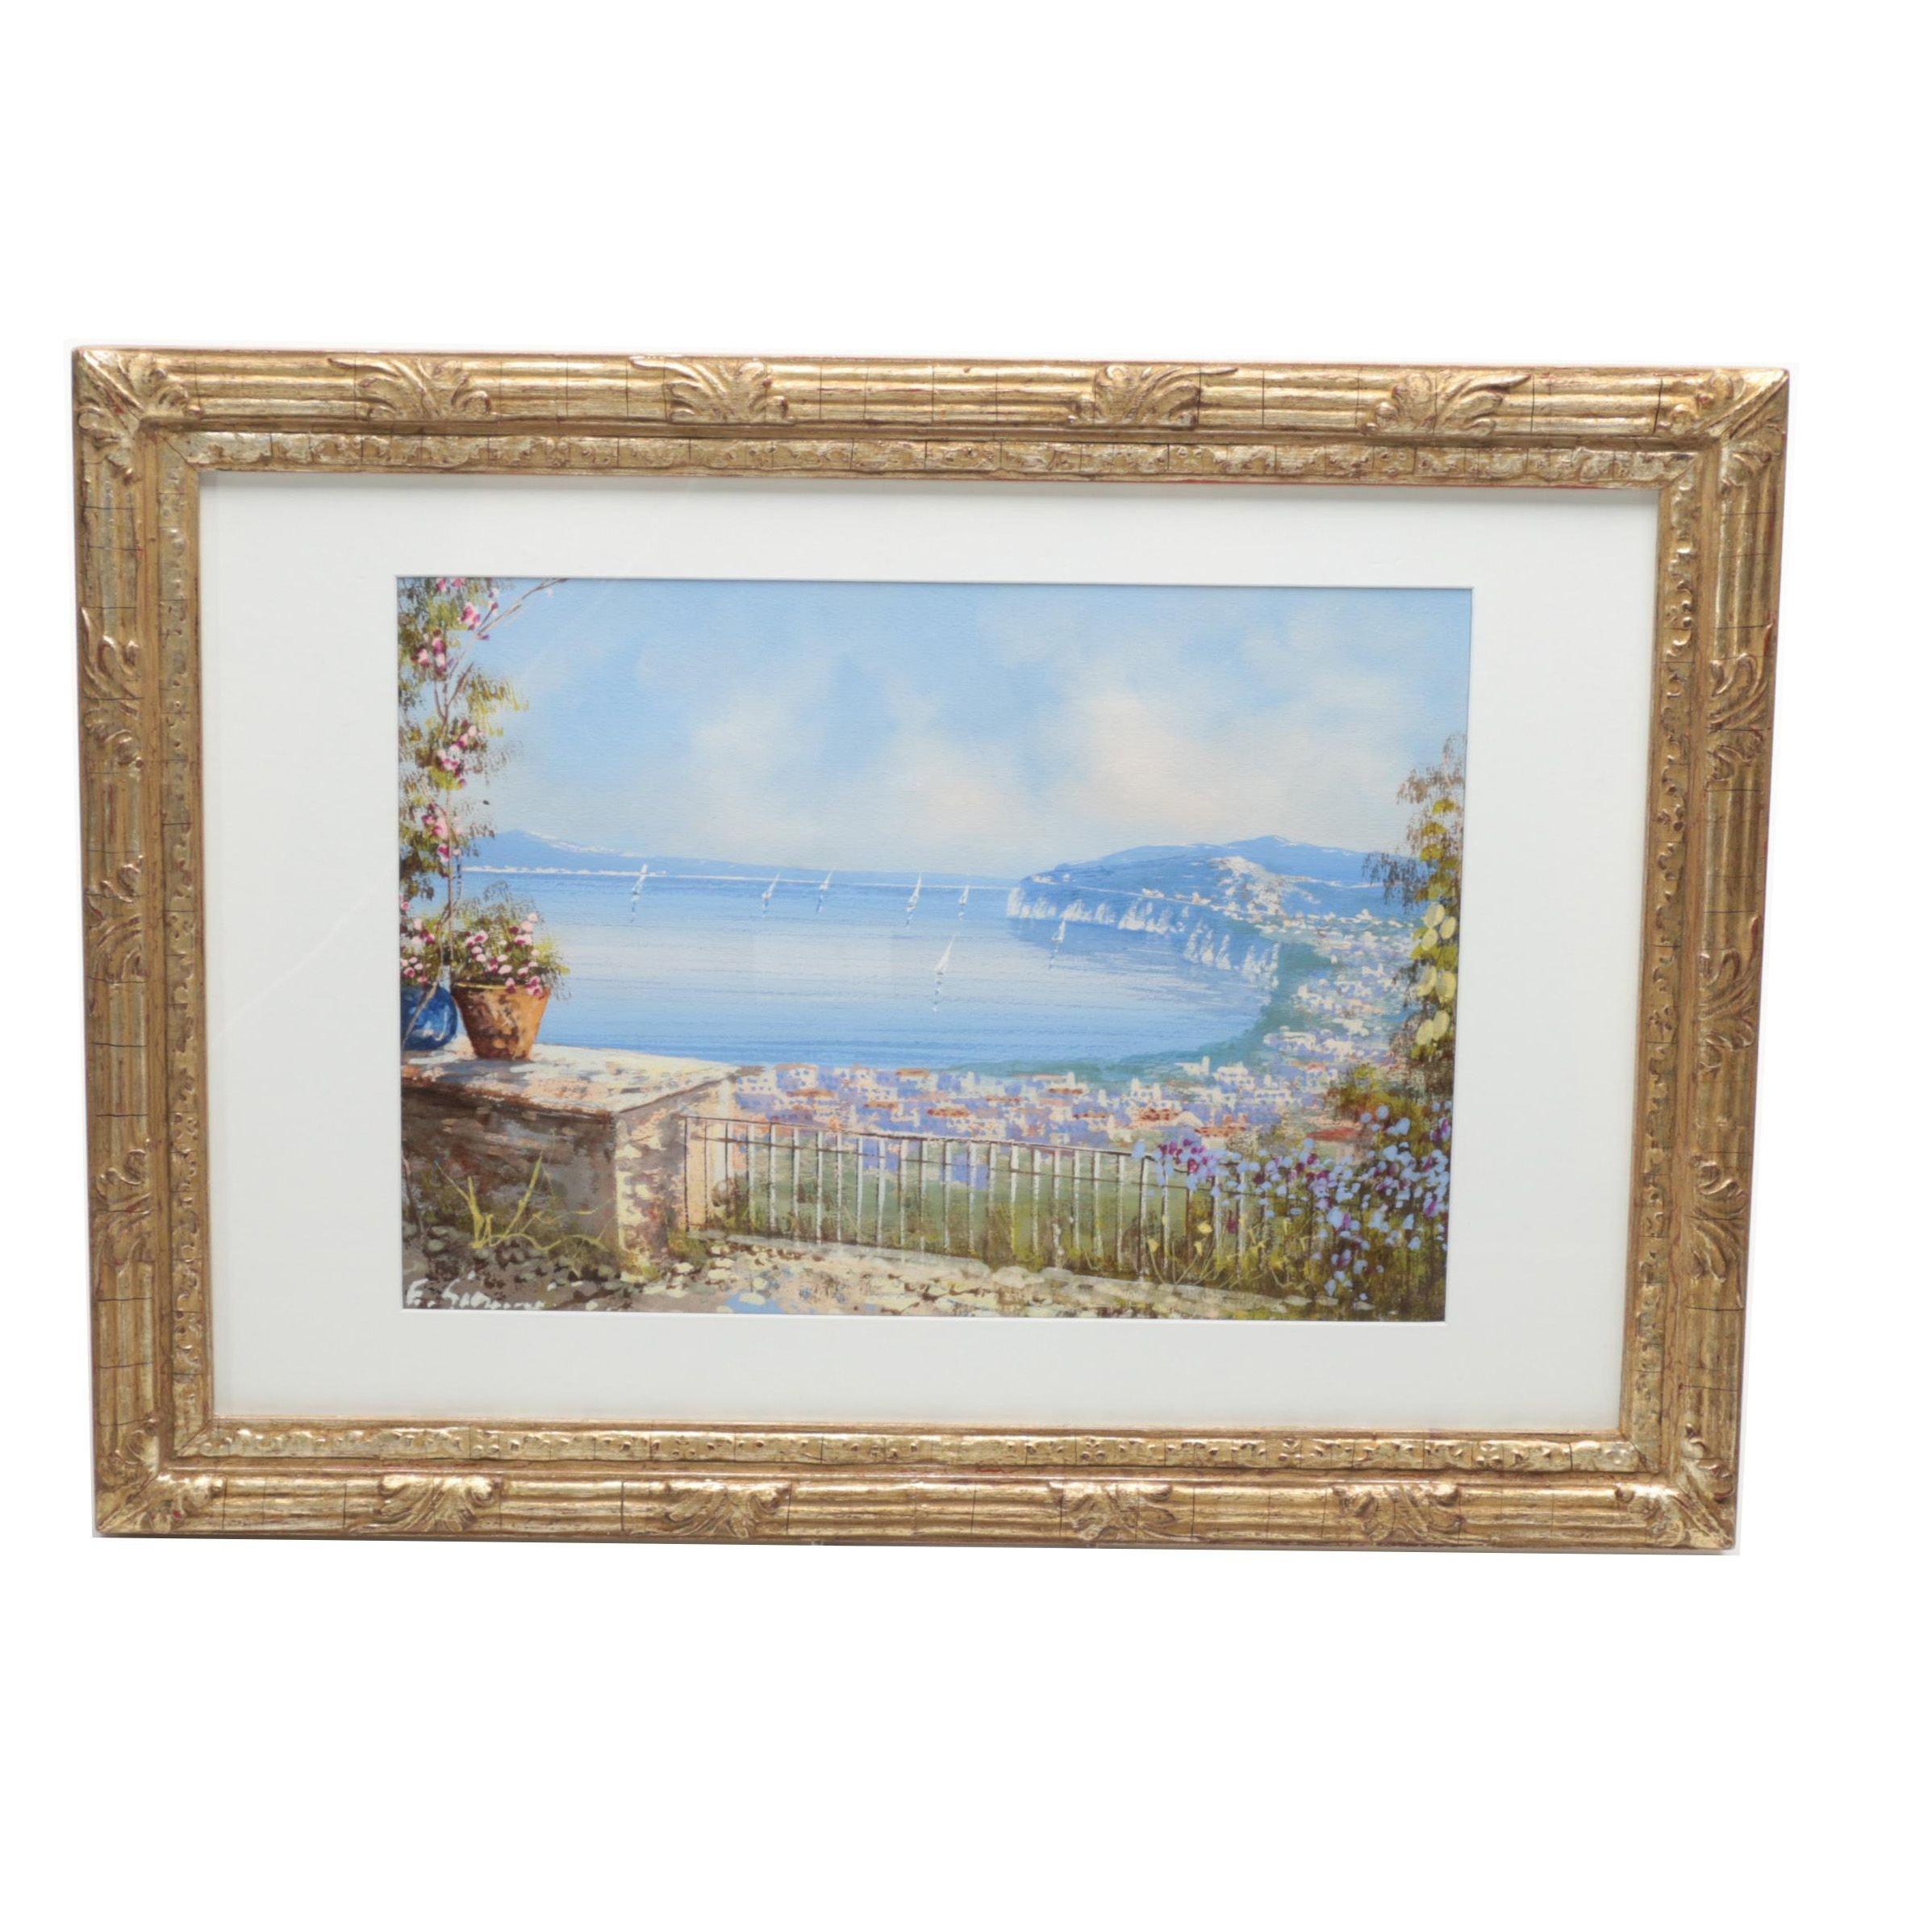 Ettore Gianni Gouache Painting on Paper of Coastal Landscape